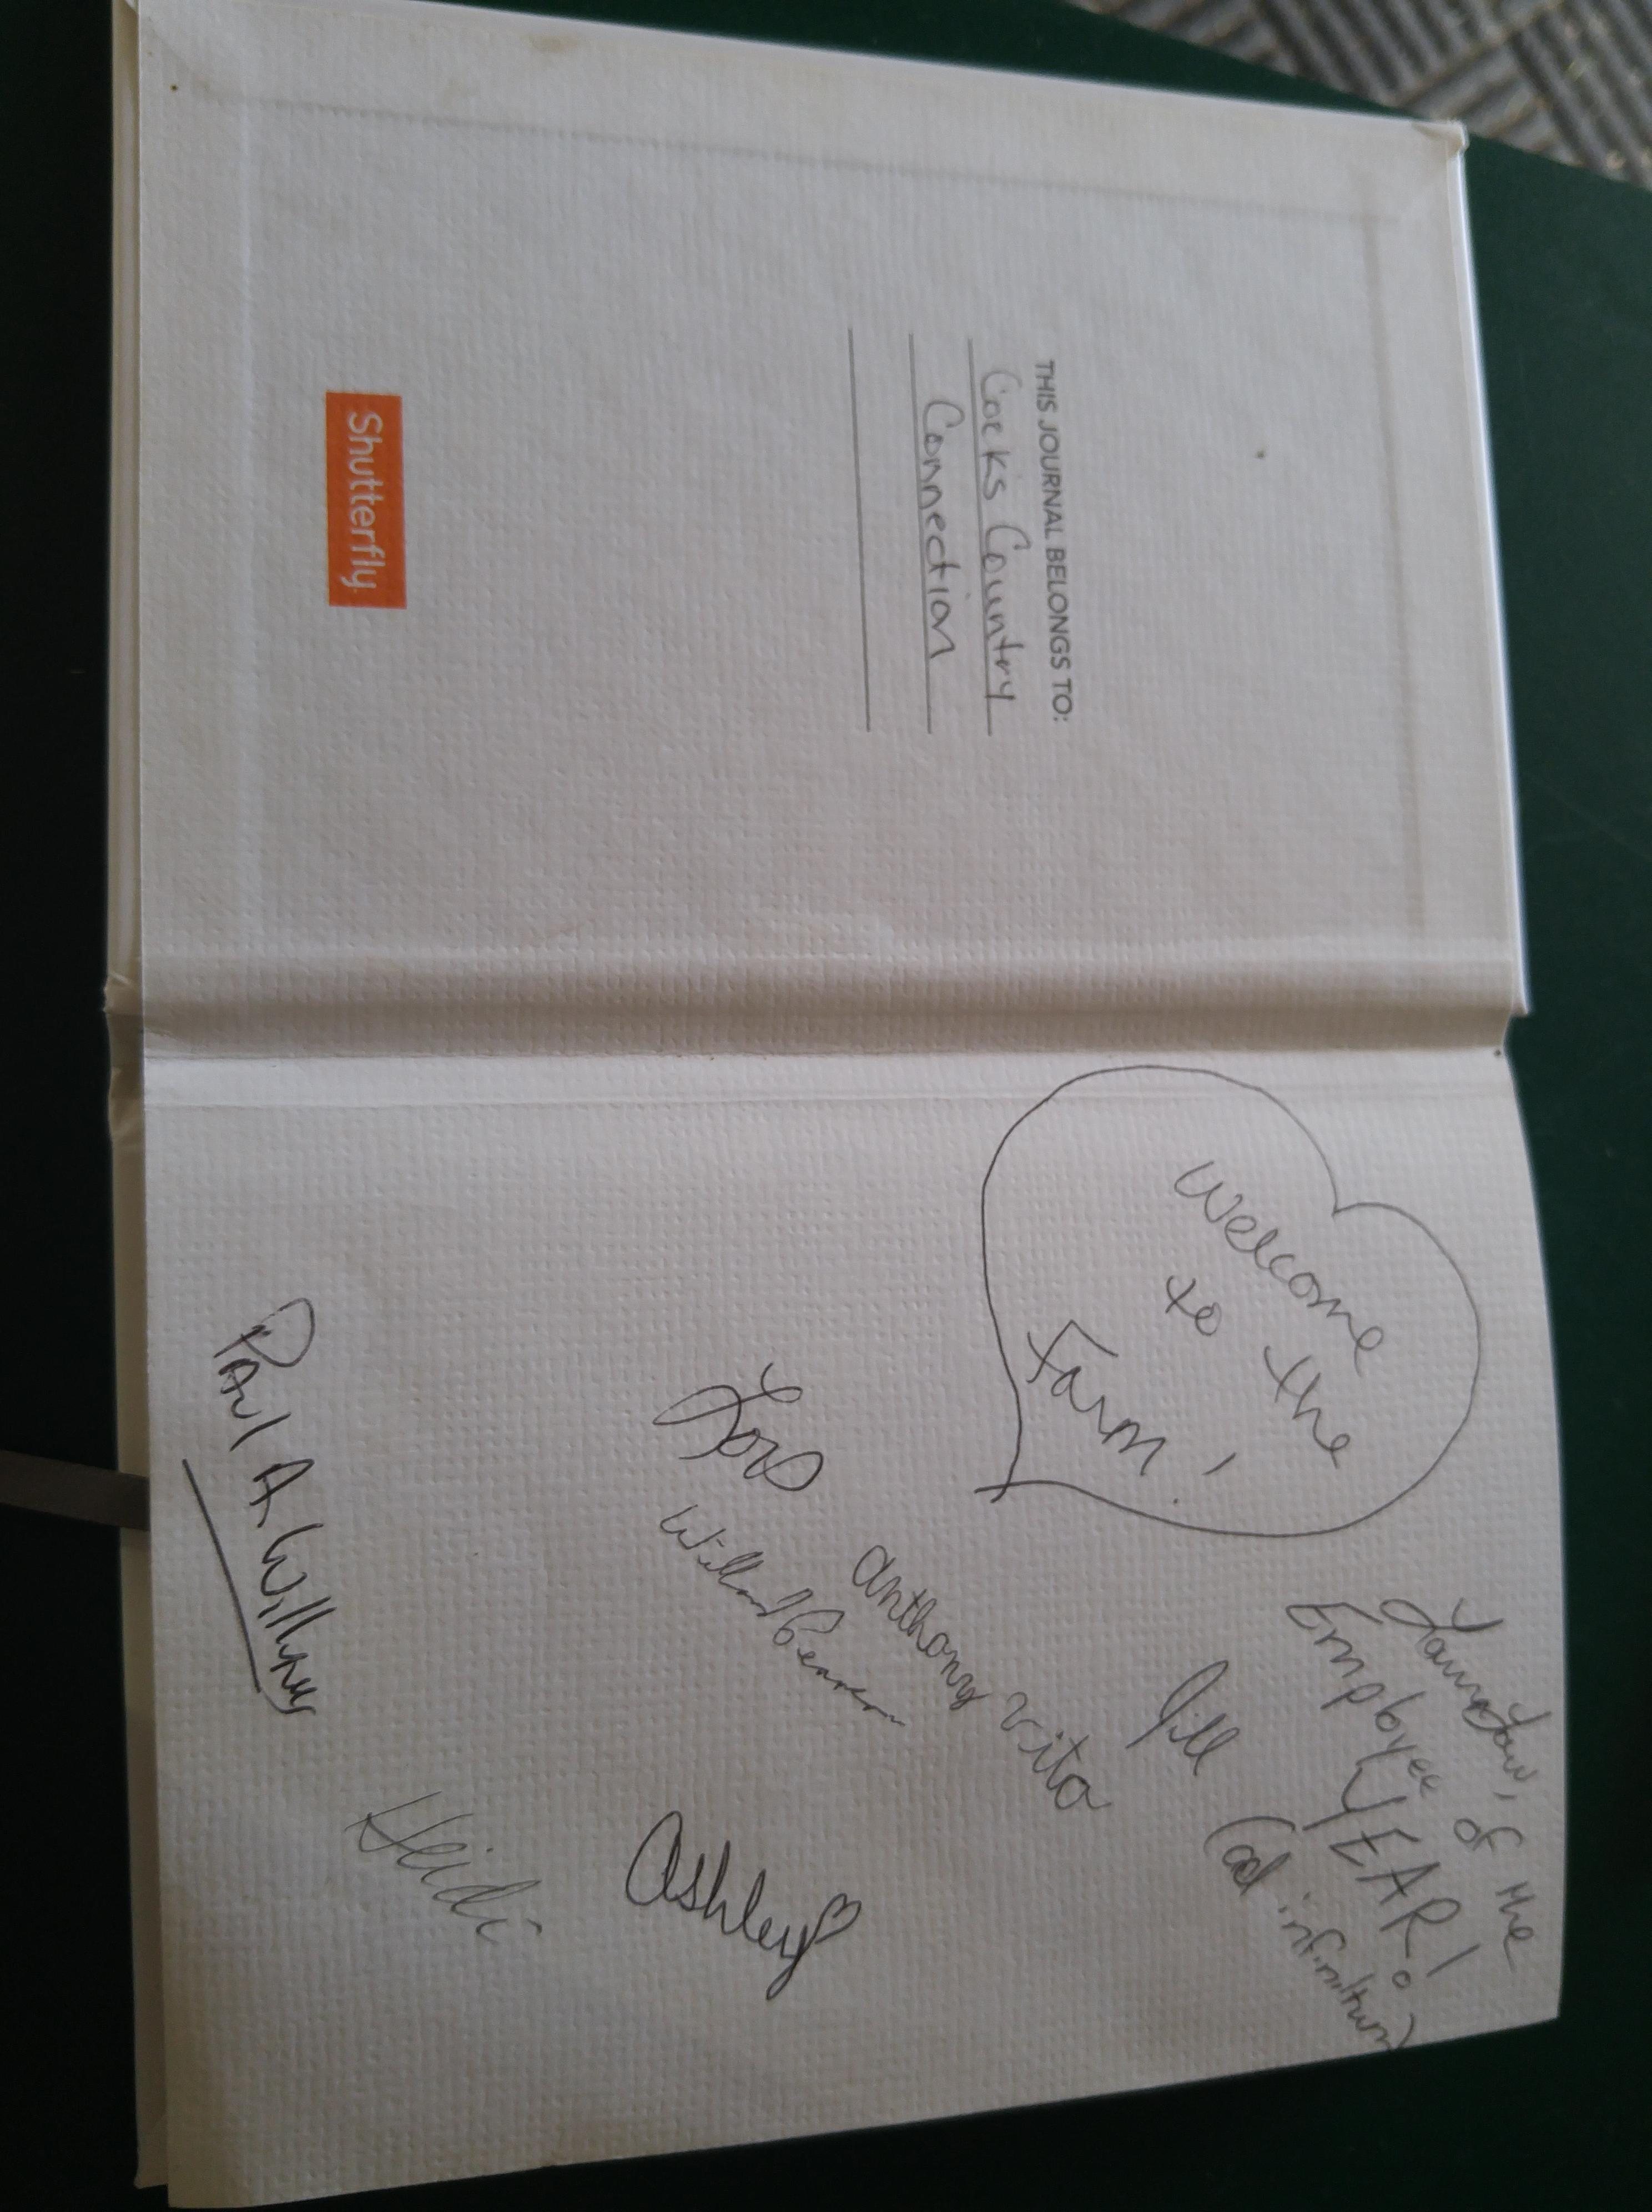 Guest book inside 1